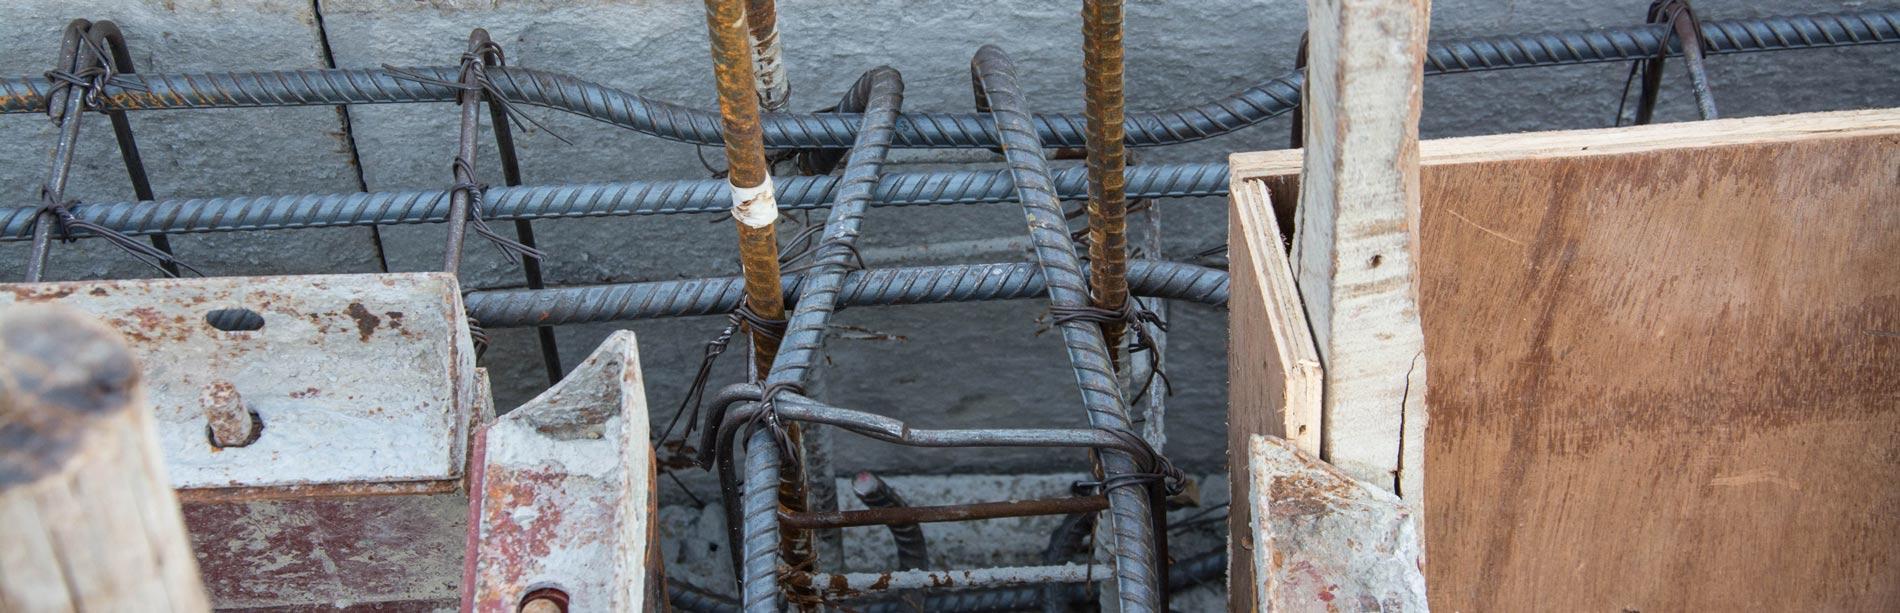 Wire foundation